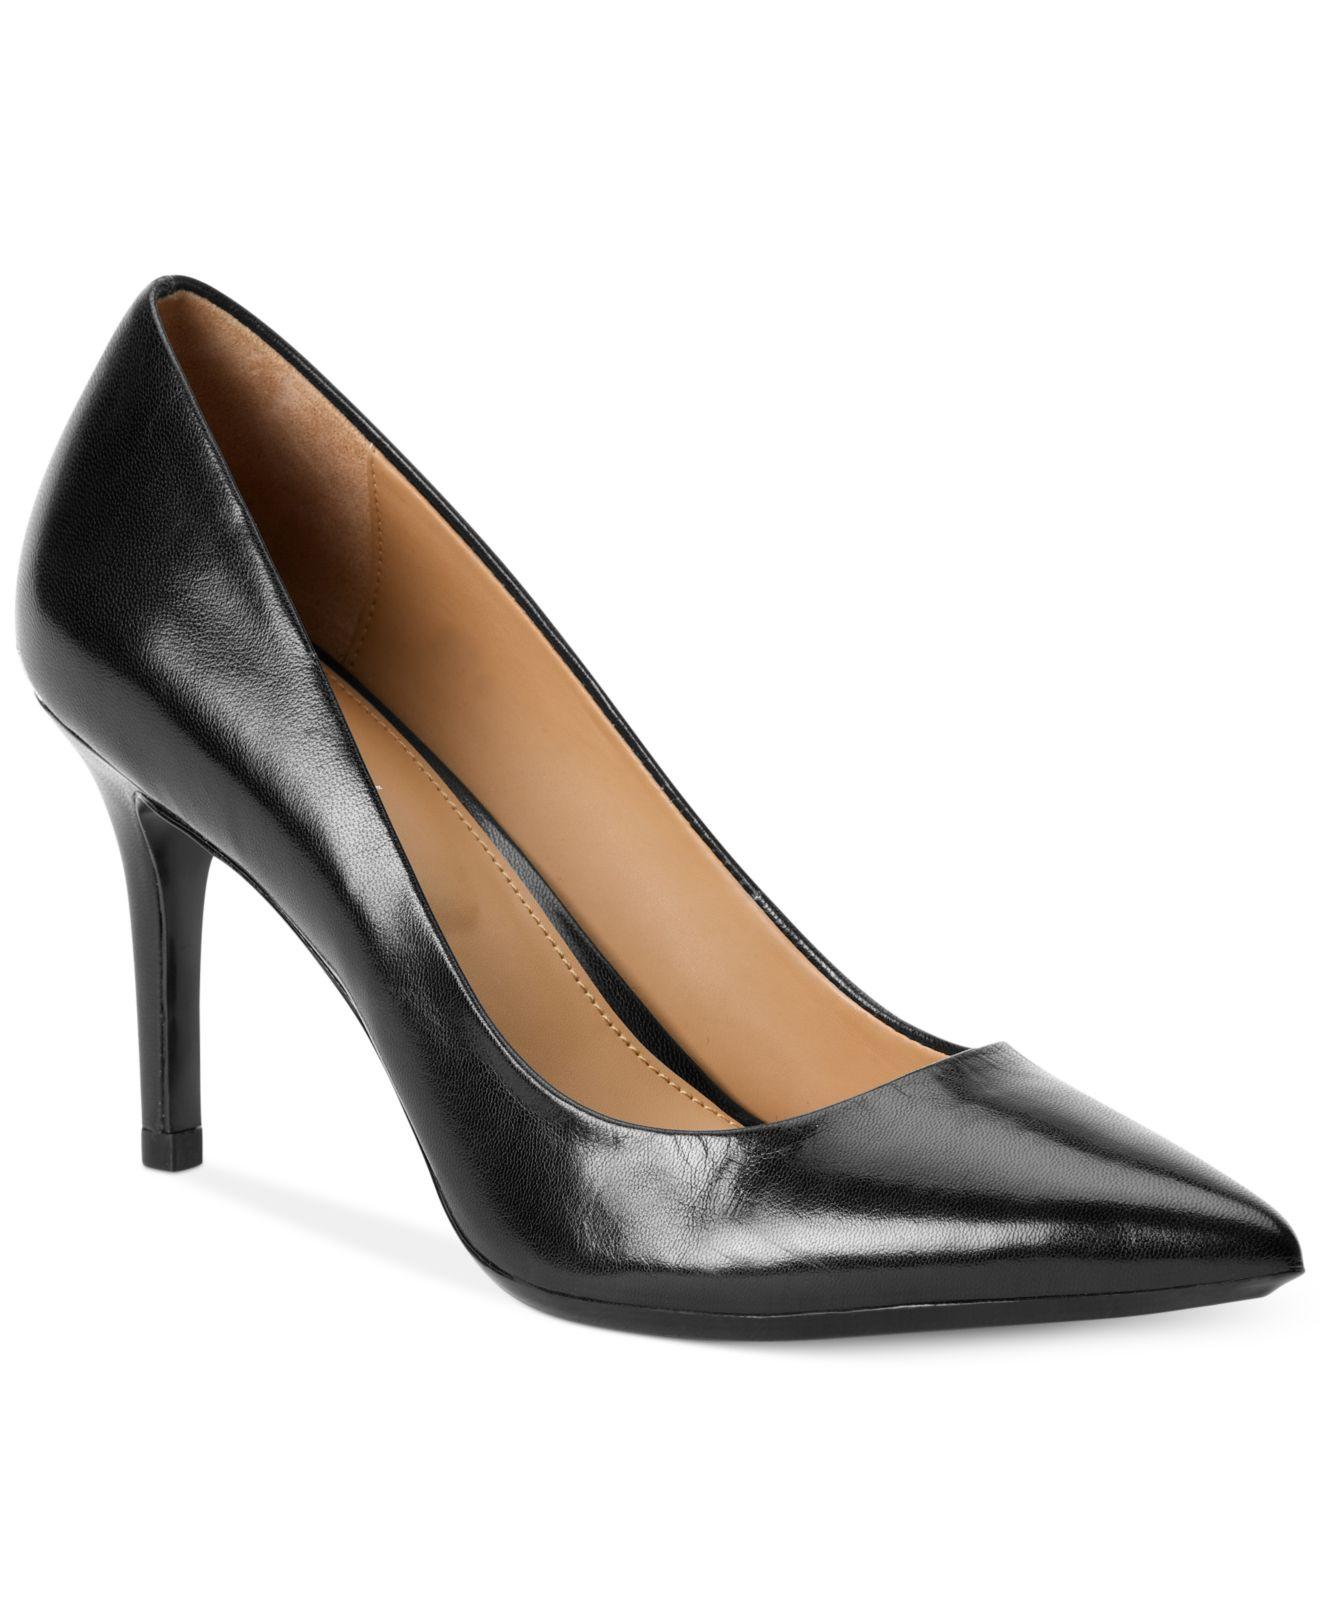 Calvin Klein Women S Gayle Pointed Toe Pumps In Black Lyst